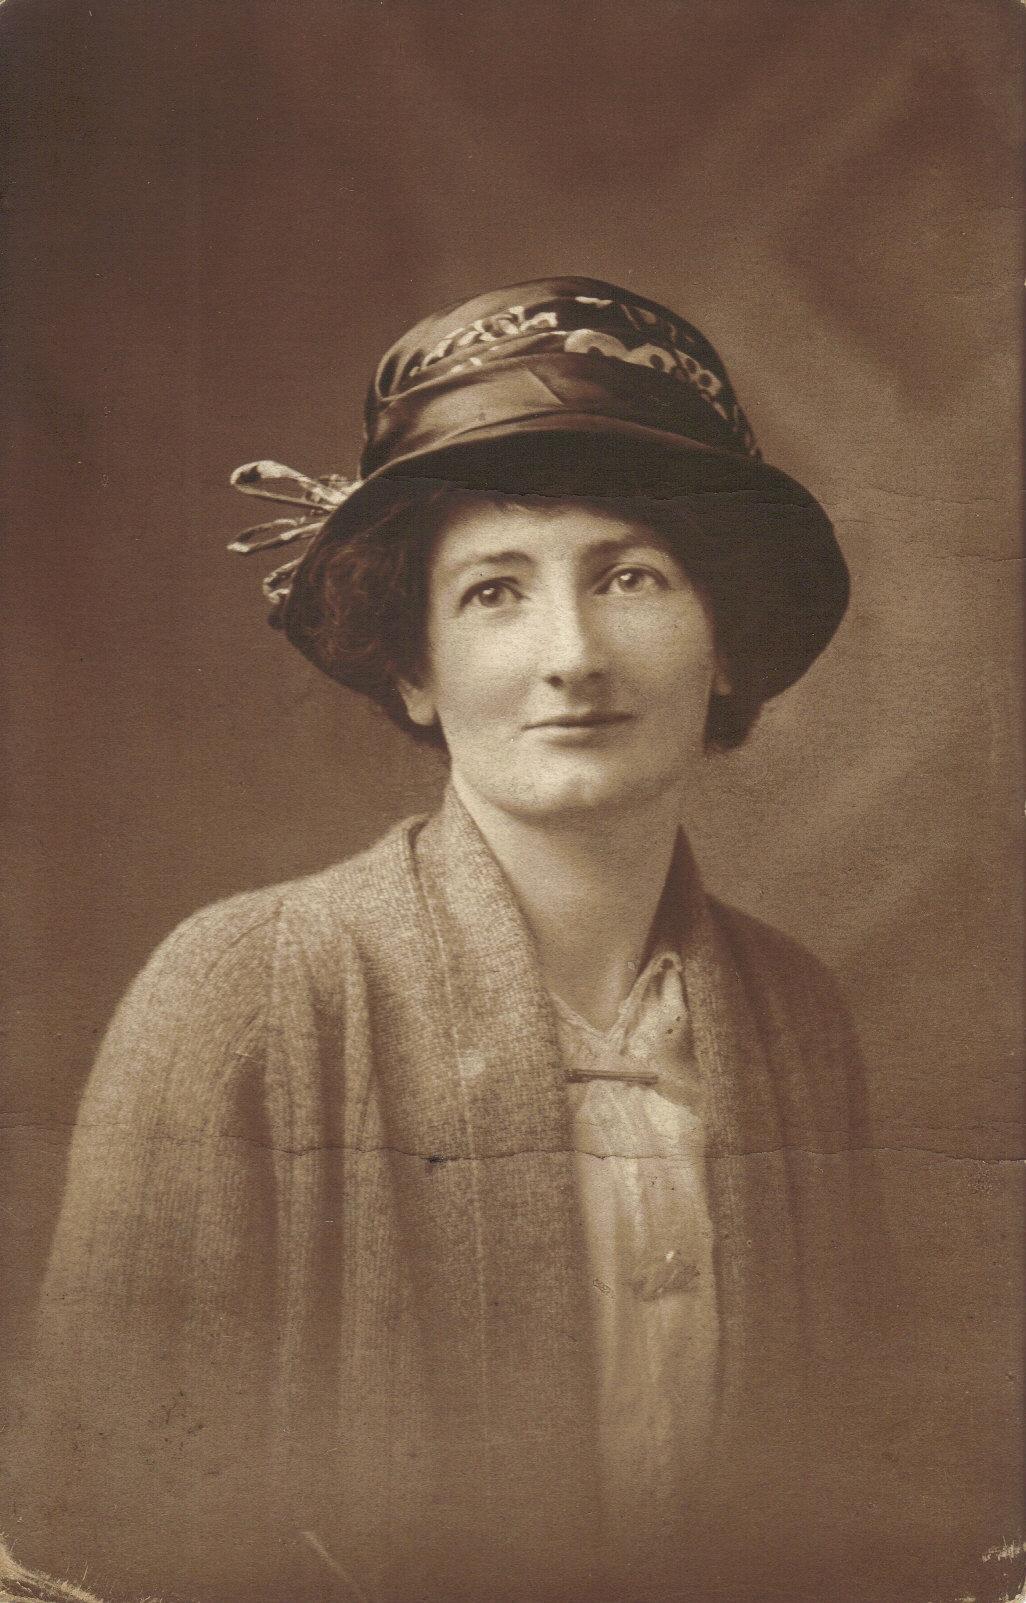 #International Women's Day 2021 and Ethel Carnie Holdsworth